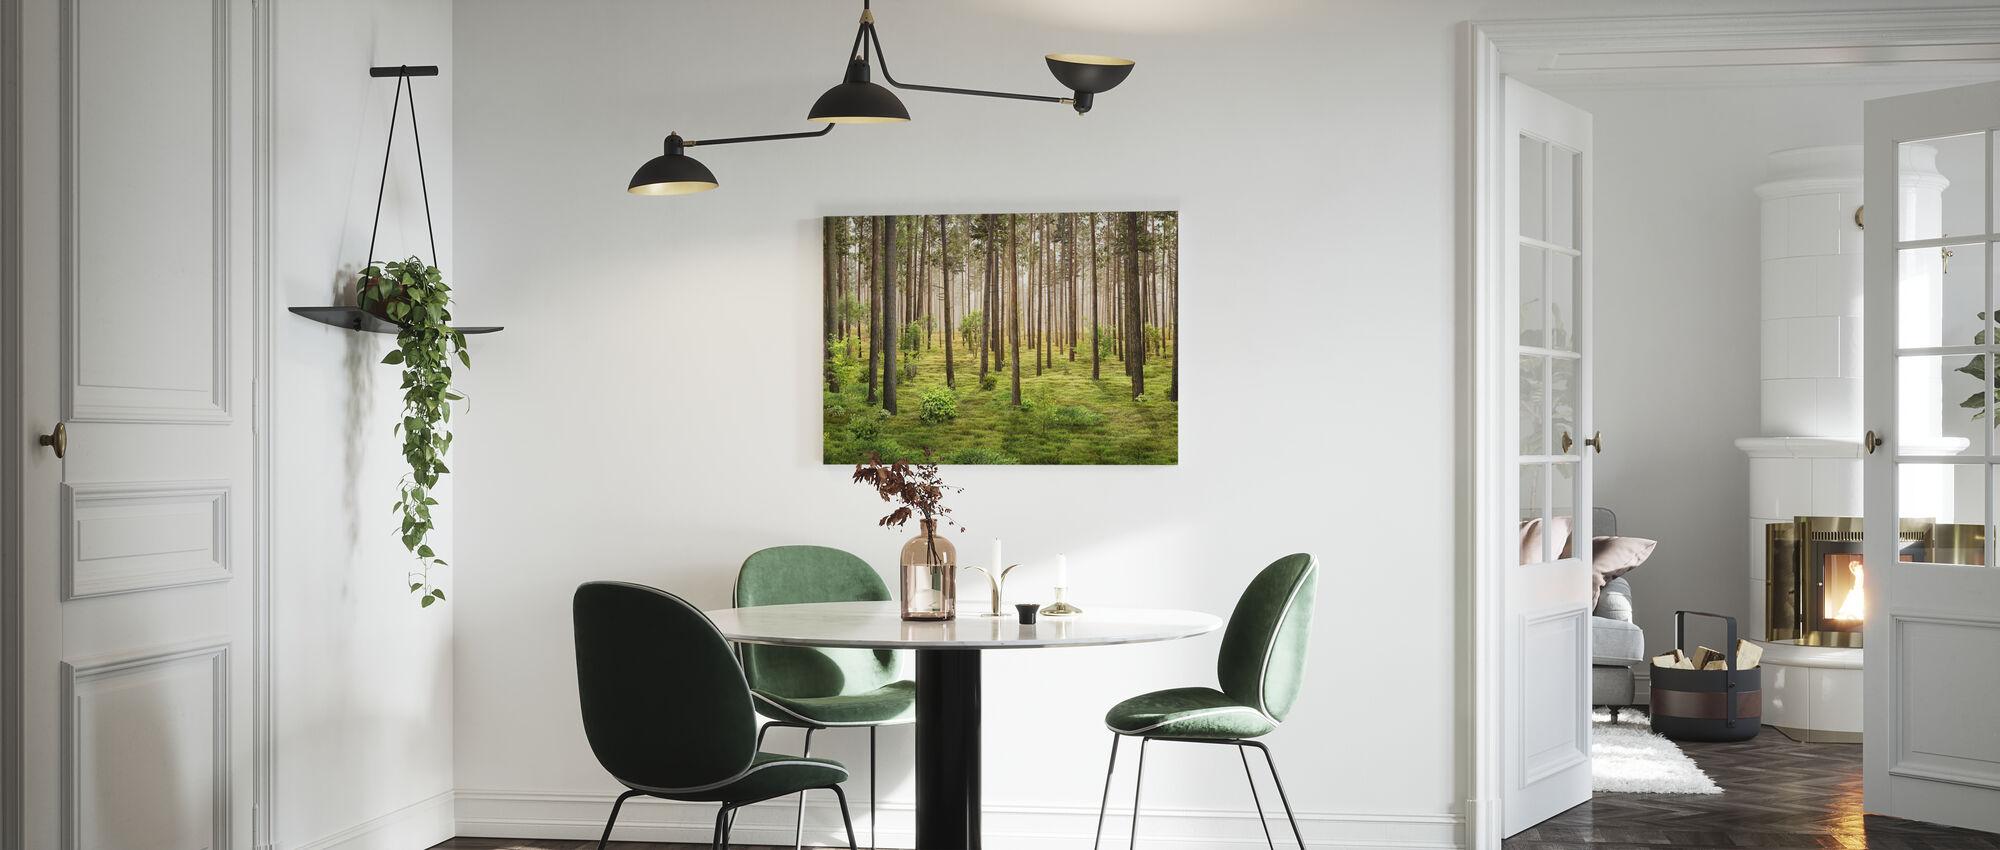 I skogen - Canvastavla - Kök